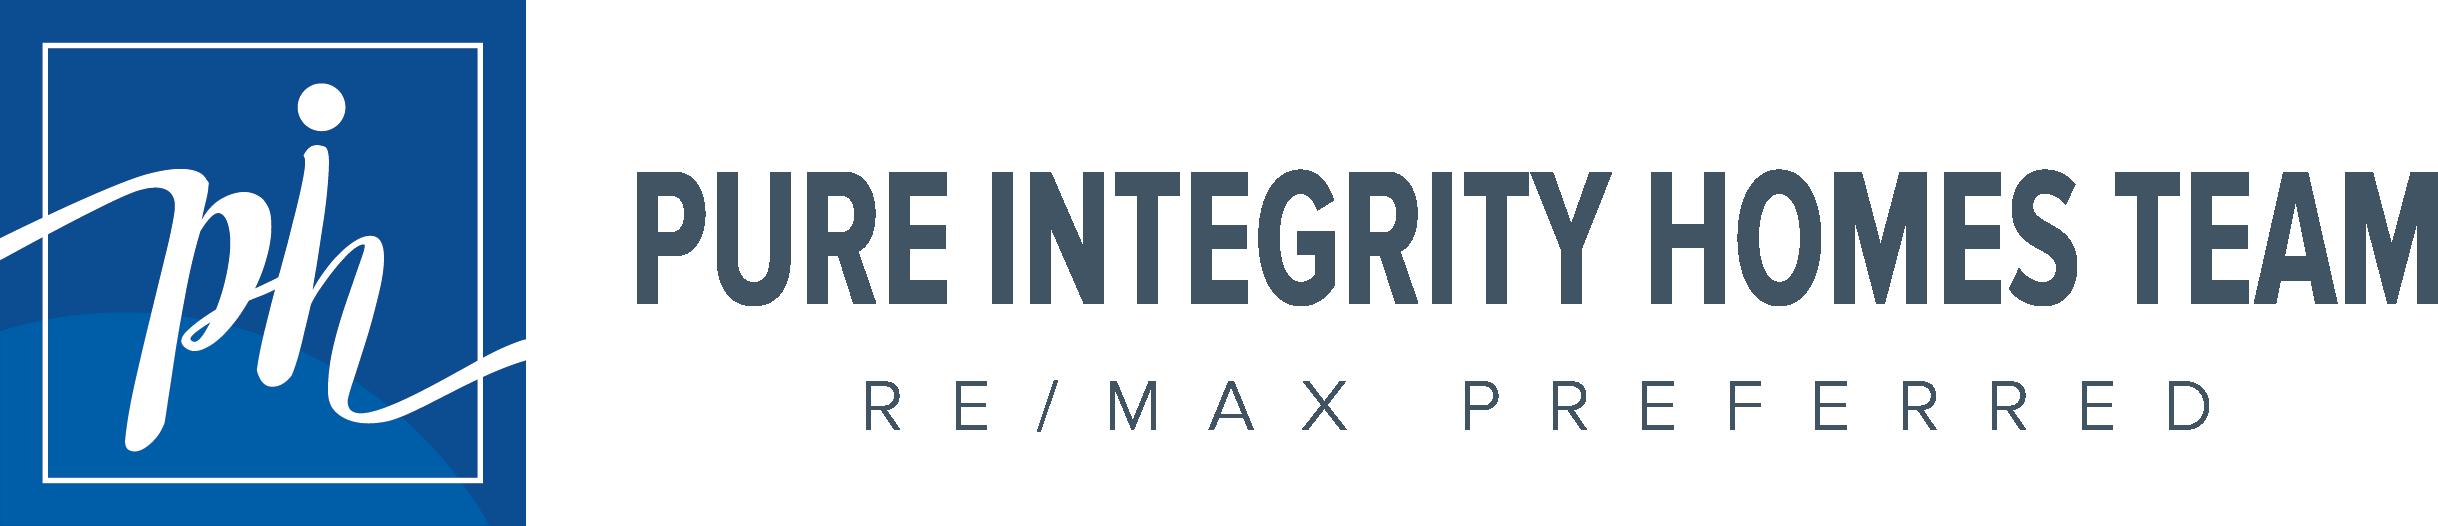 Pure Integrity Homes Team | RE/MAX Preferred